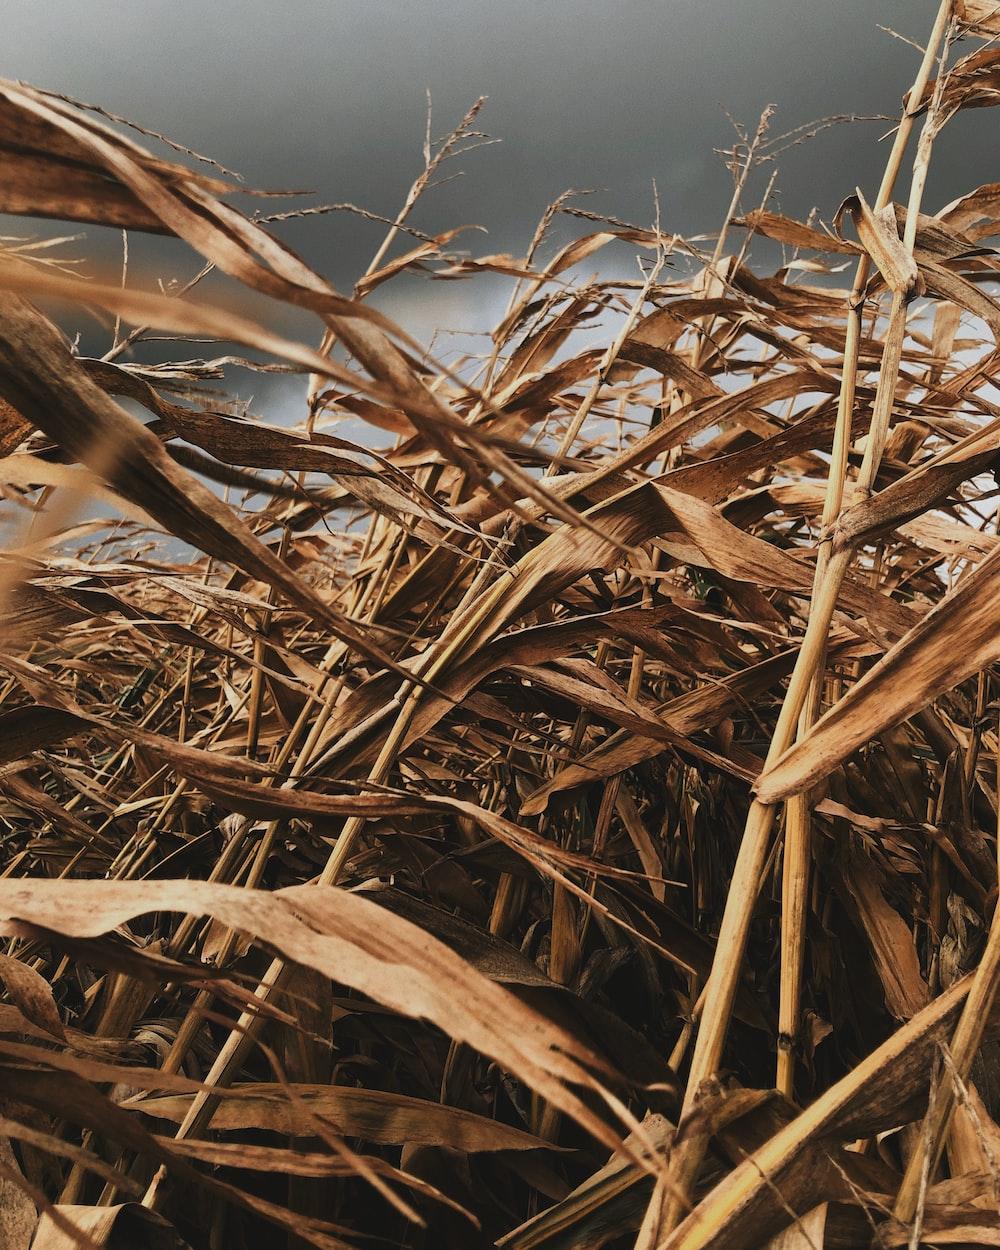 brown dried grass under blue sky during daytime